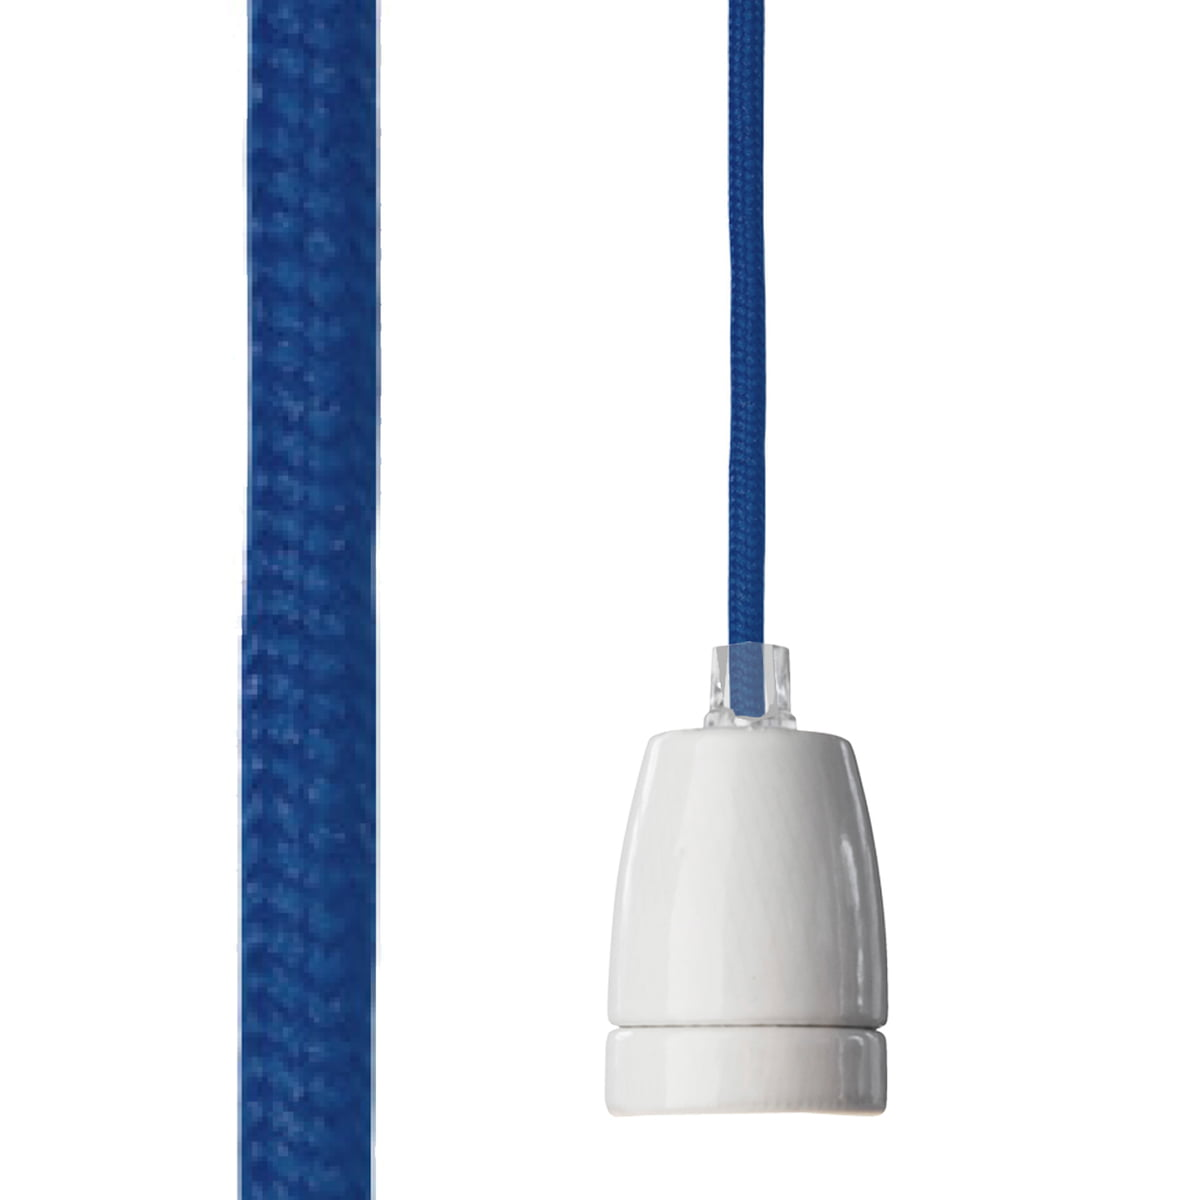 NUD COLLECTION pendule Lampe Classic Noir Surf The Web